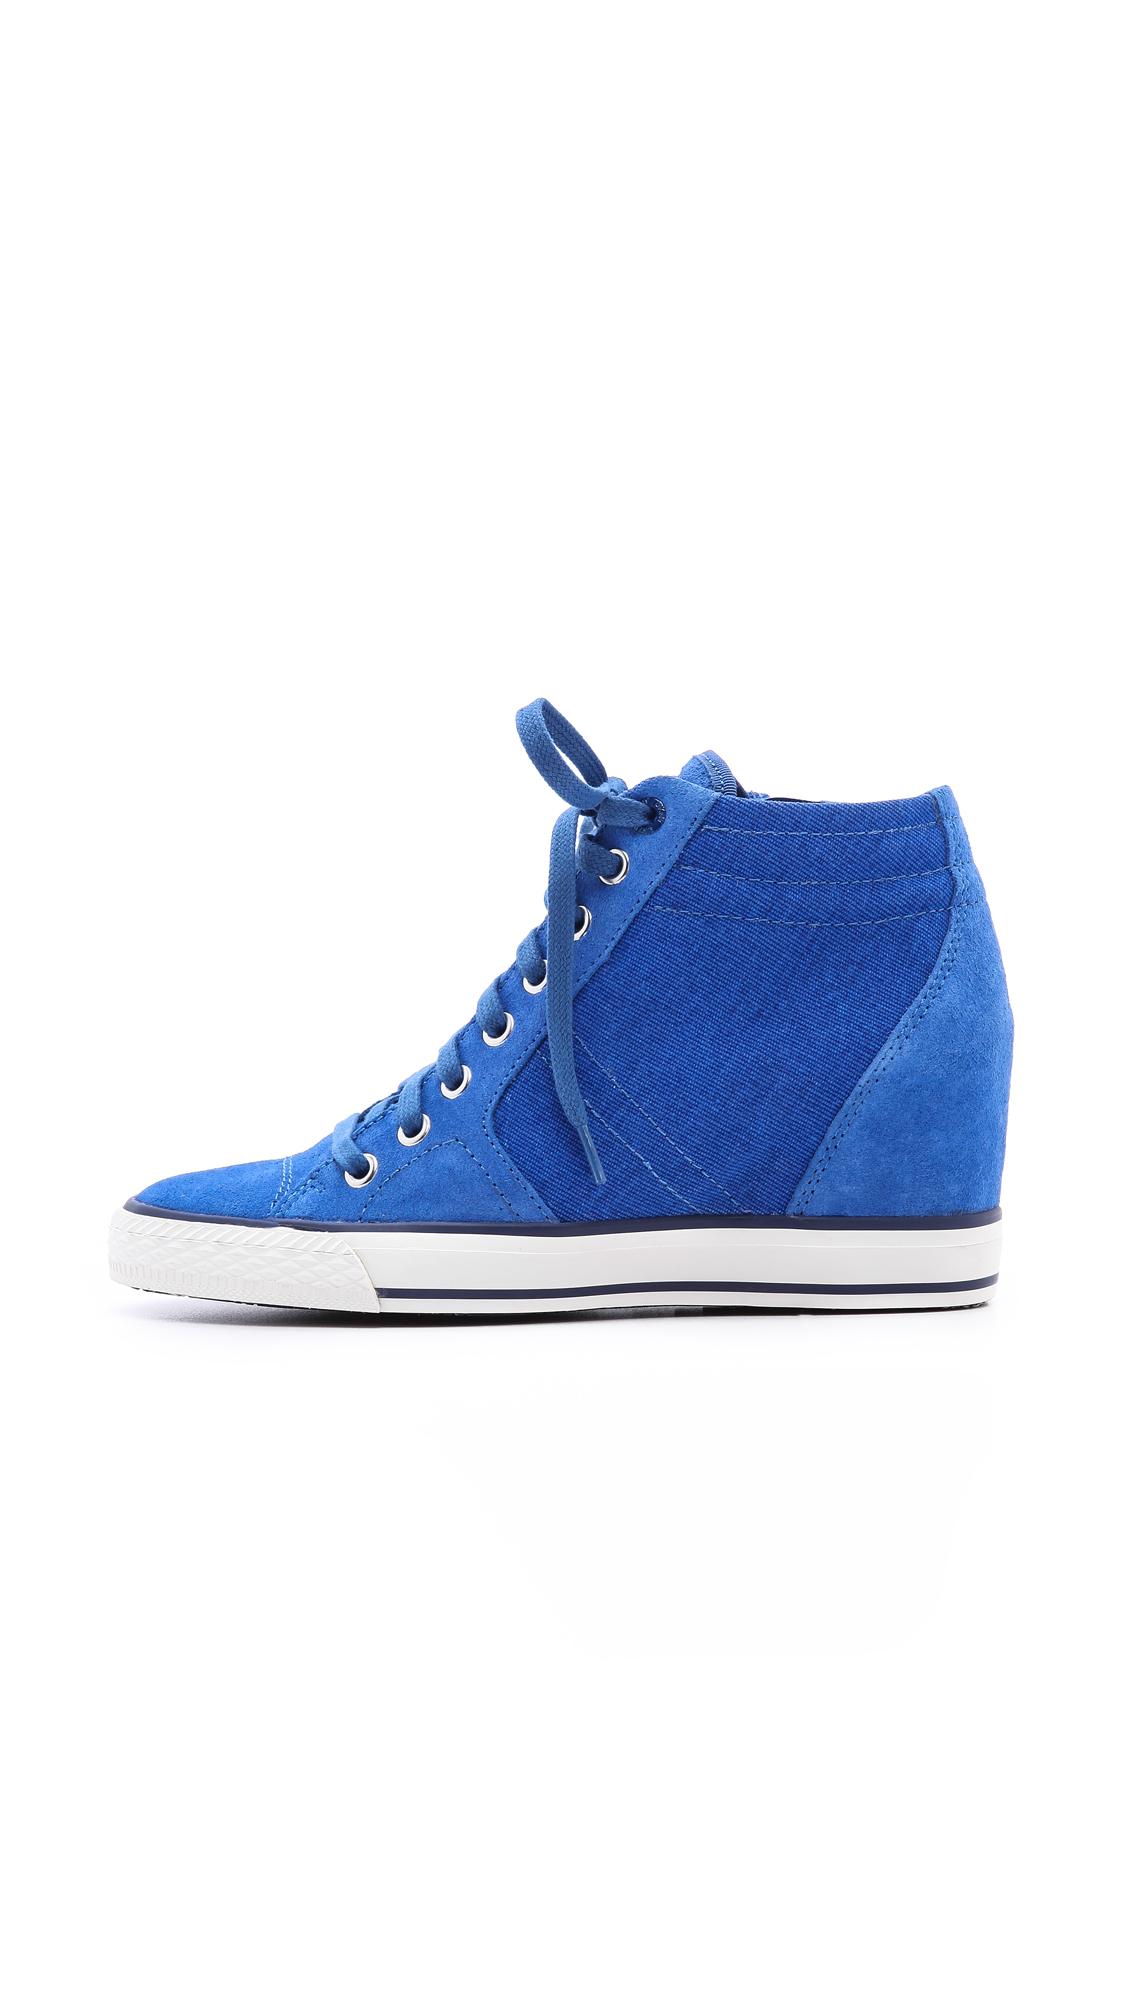 Lyst Dkny Cindy Wedge Sneakers In Blue